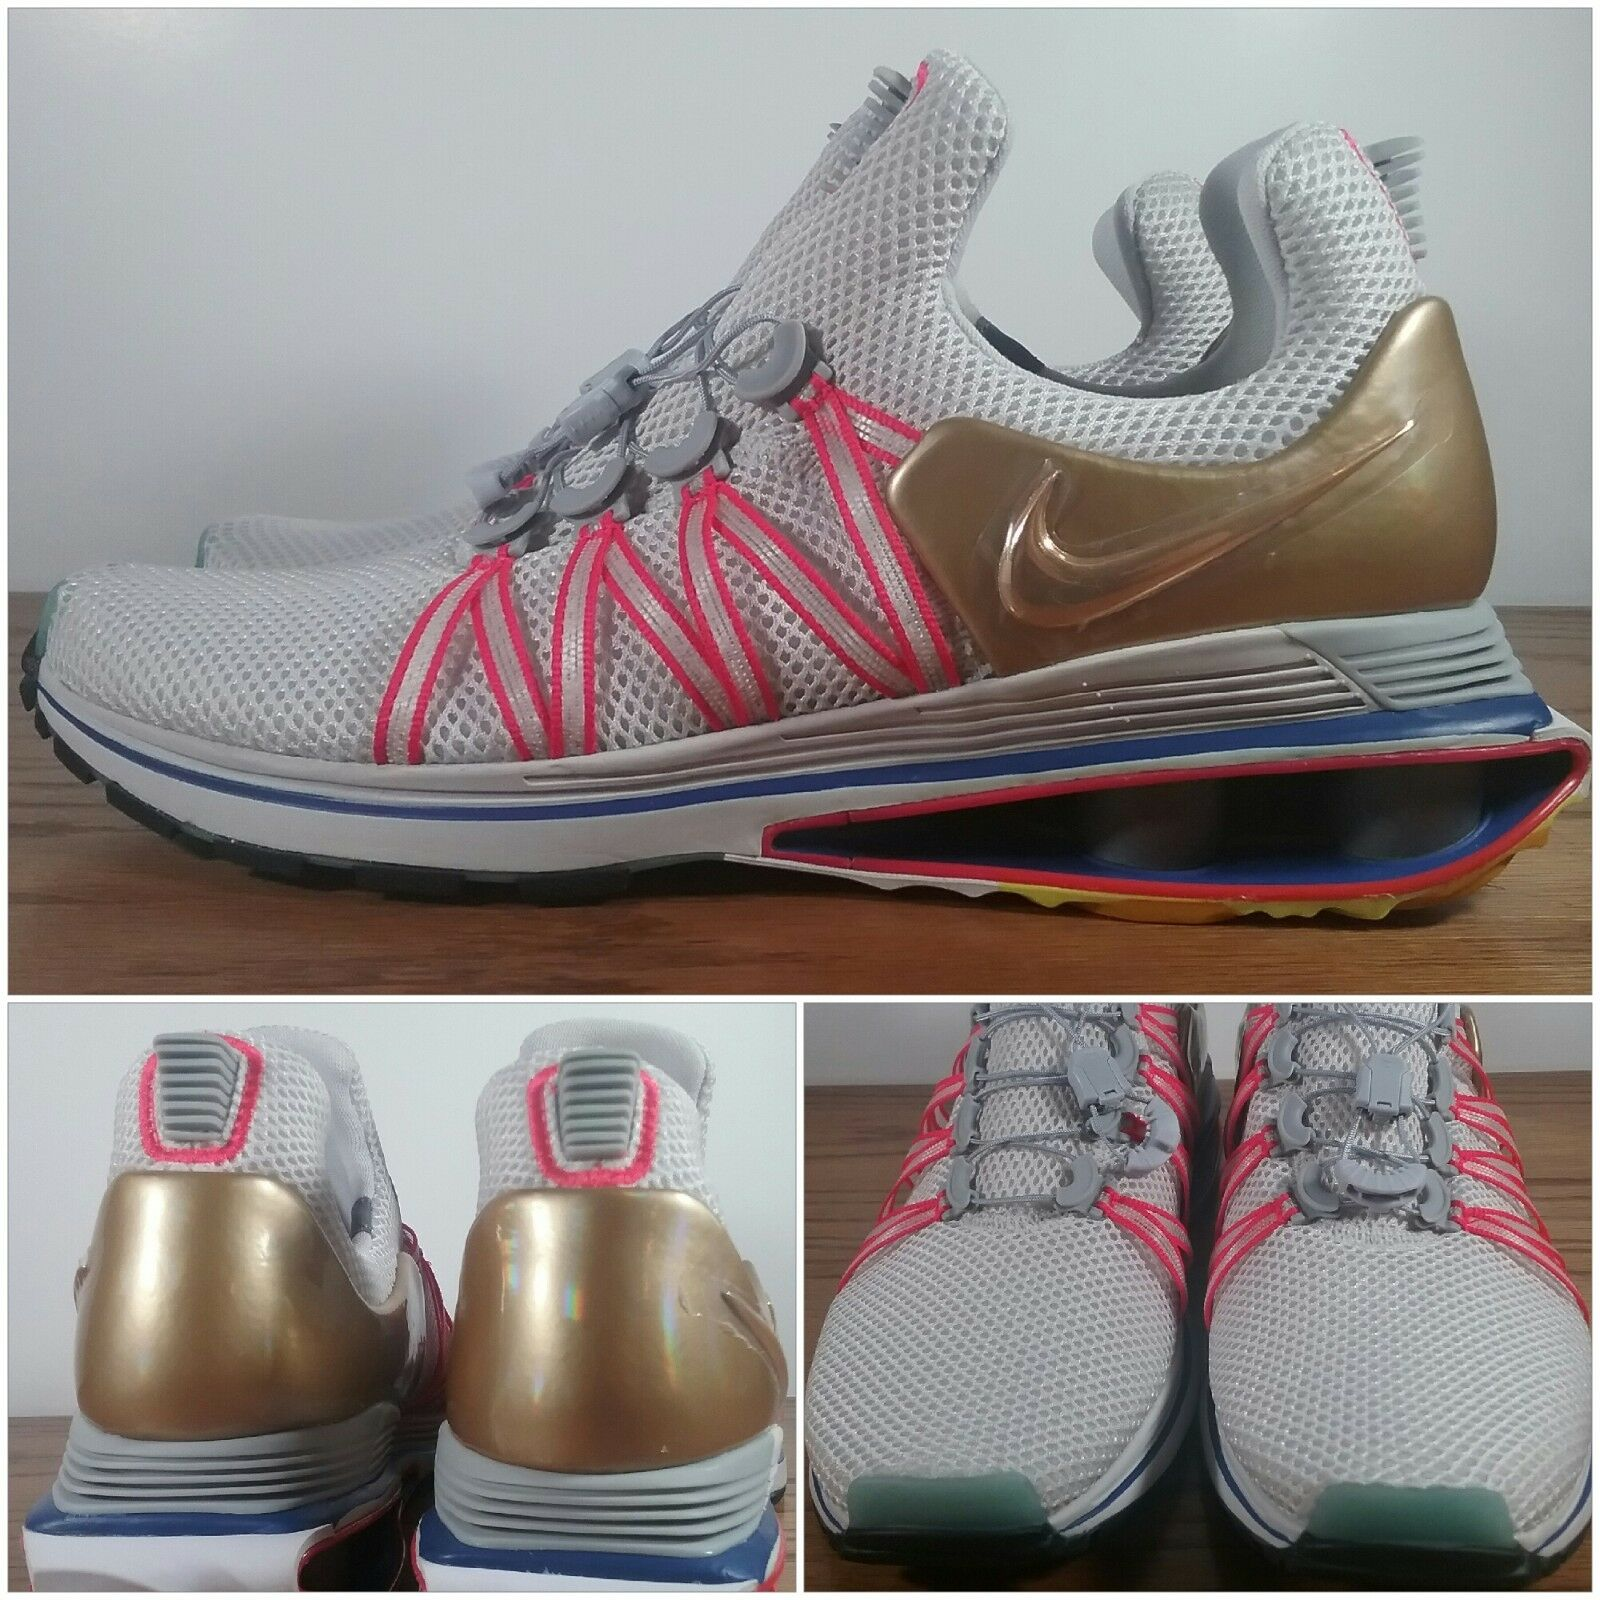 New Nike Shox Gravity  Olympic  Vast Grey Metallic gold AQ8553-009 Men's Sizes